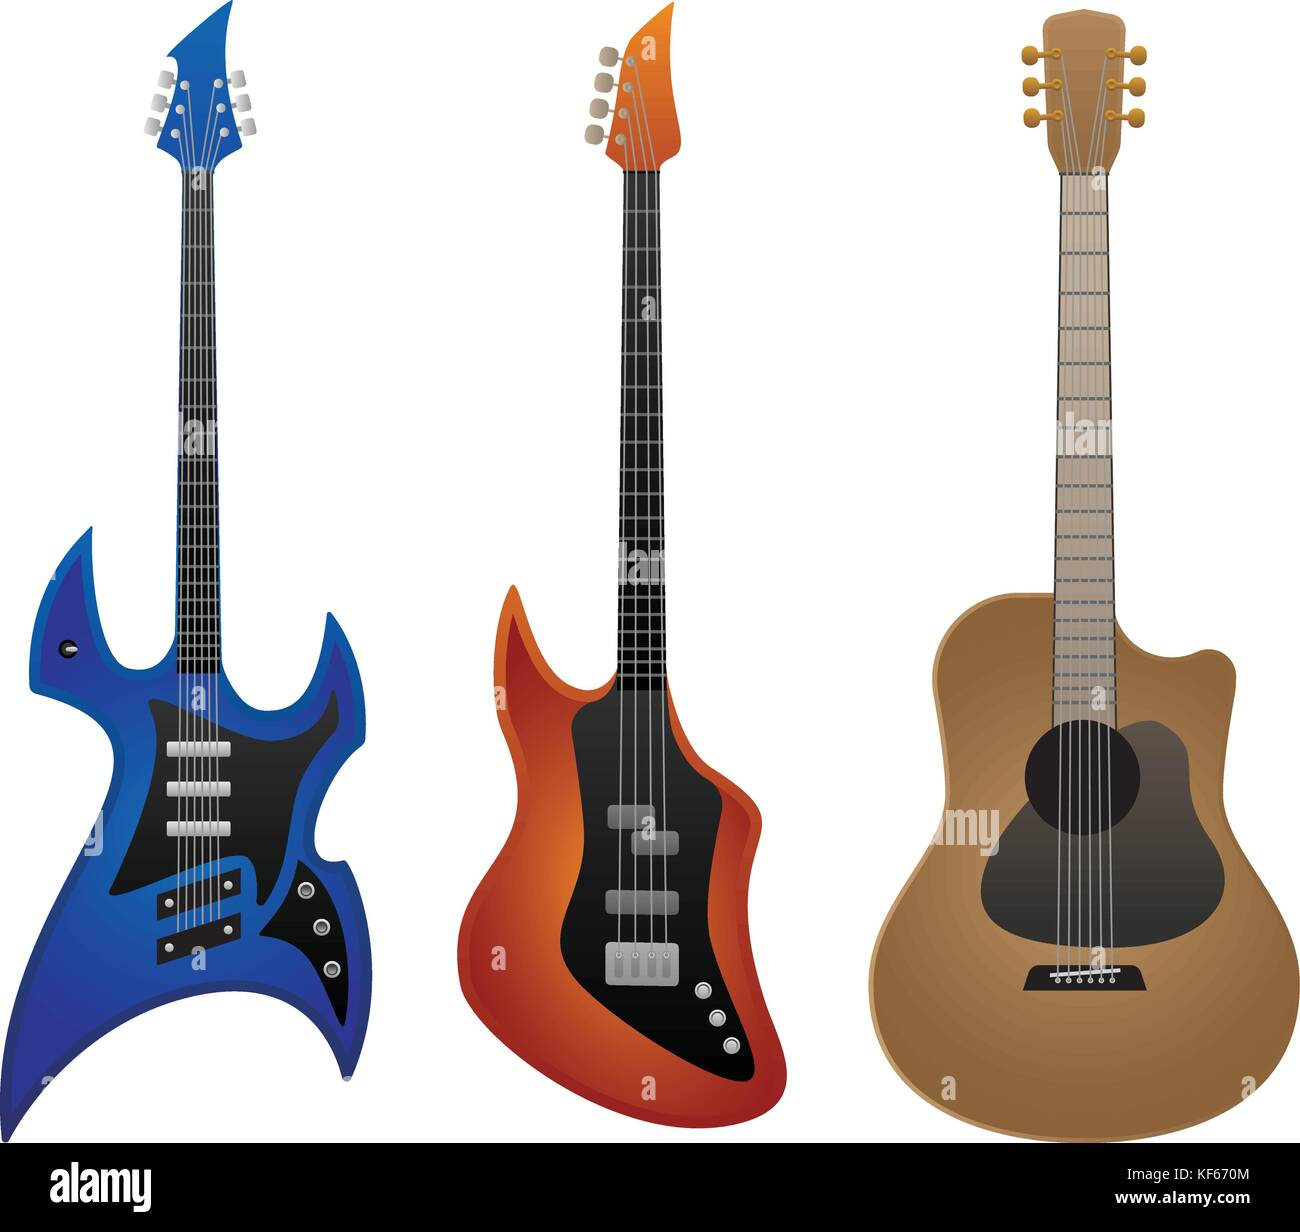 Electric Rock Guitar, Bass Guitar and Acoustic Guitar Vector Stock